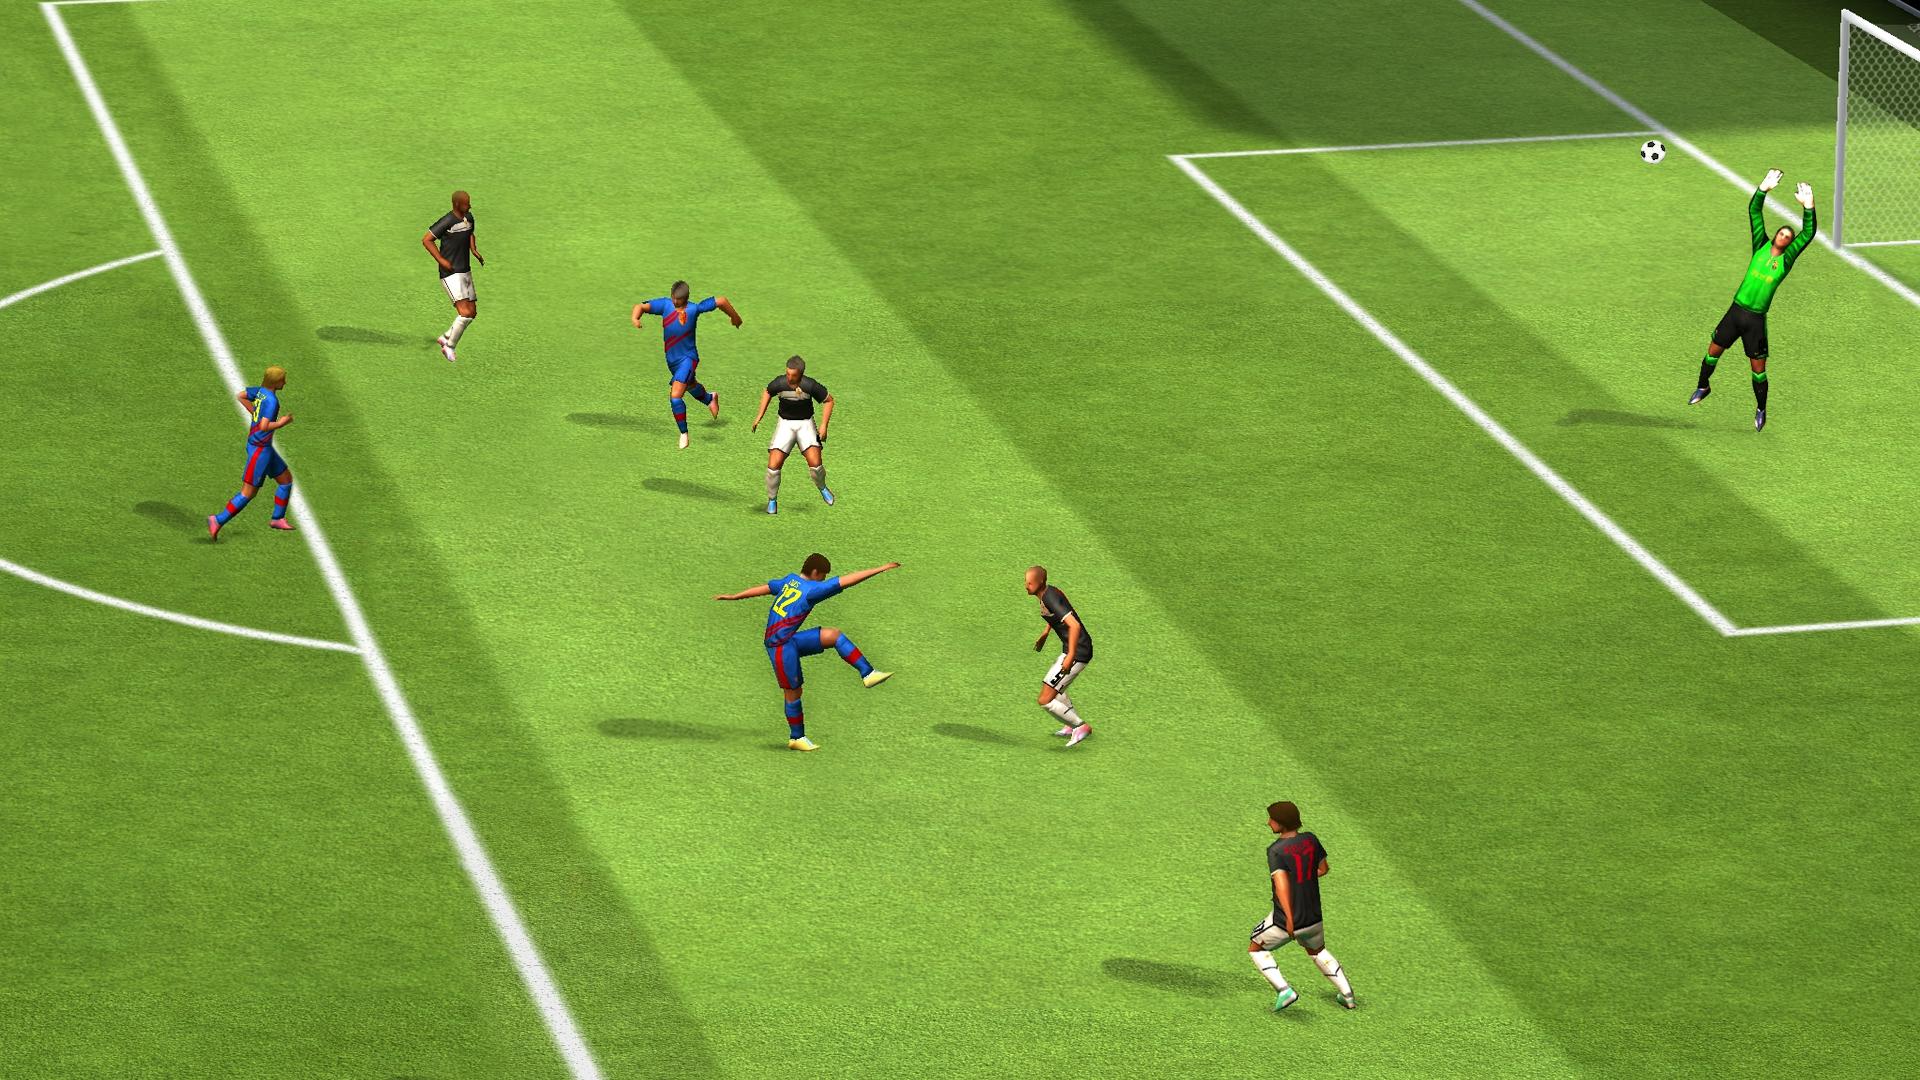 Real Football 2013 screenshot #12